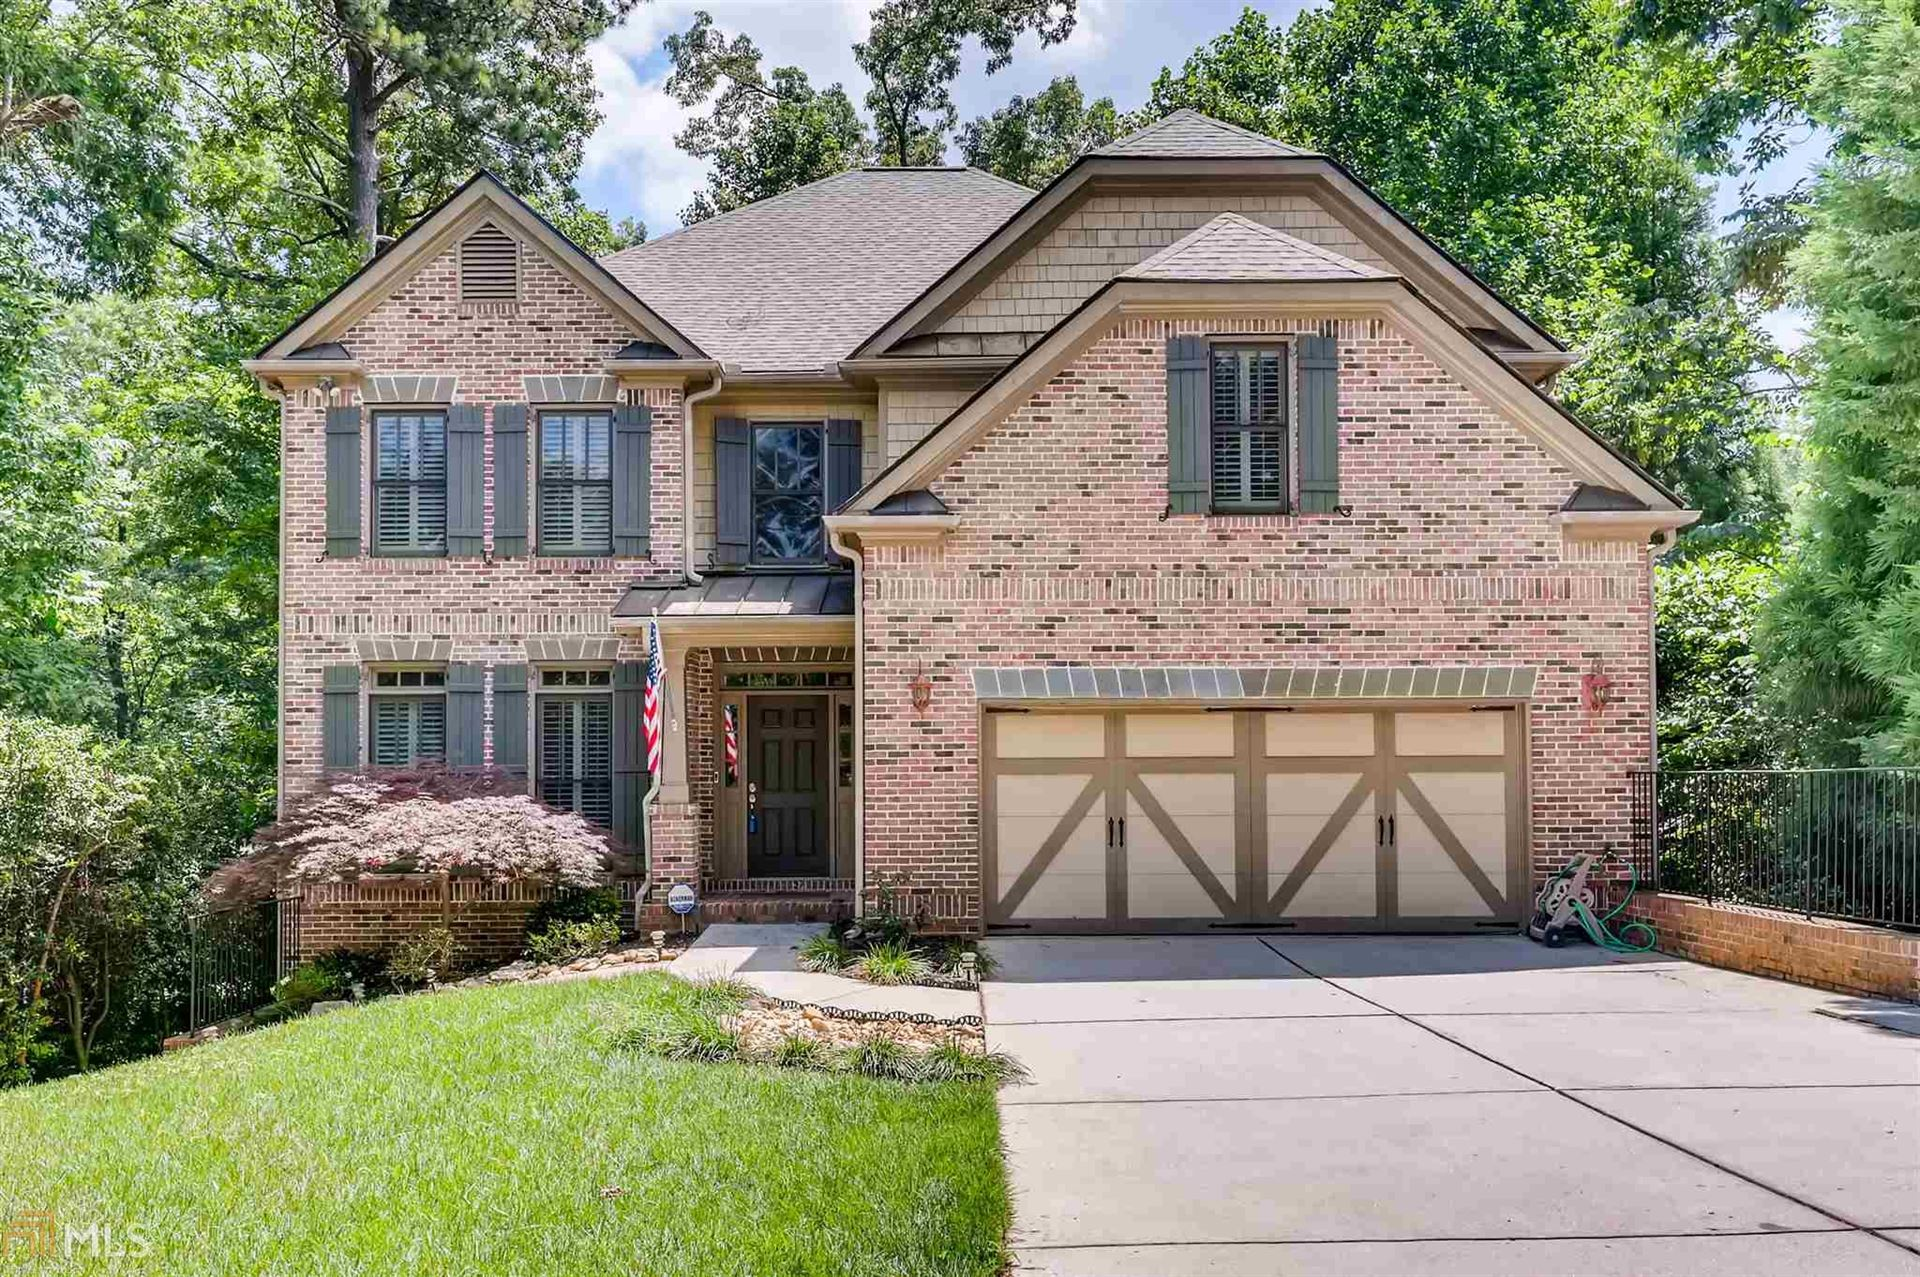 1917 Oak Grove Rd, Atlanta, GA 30345 - #: 8815235